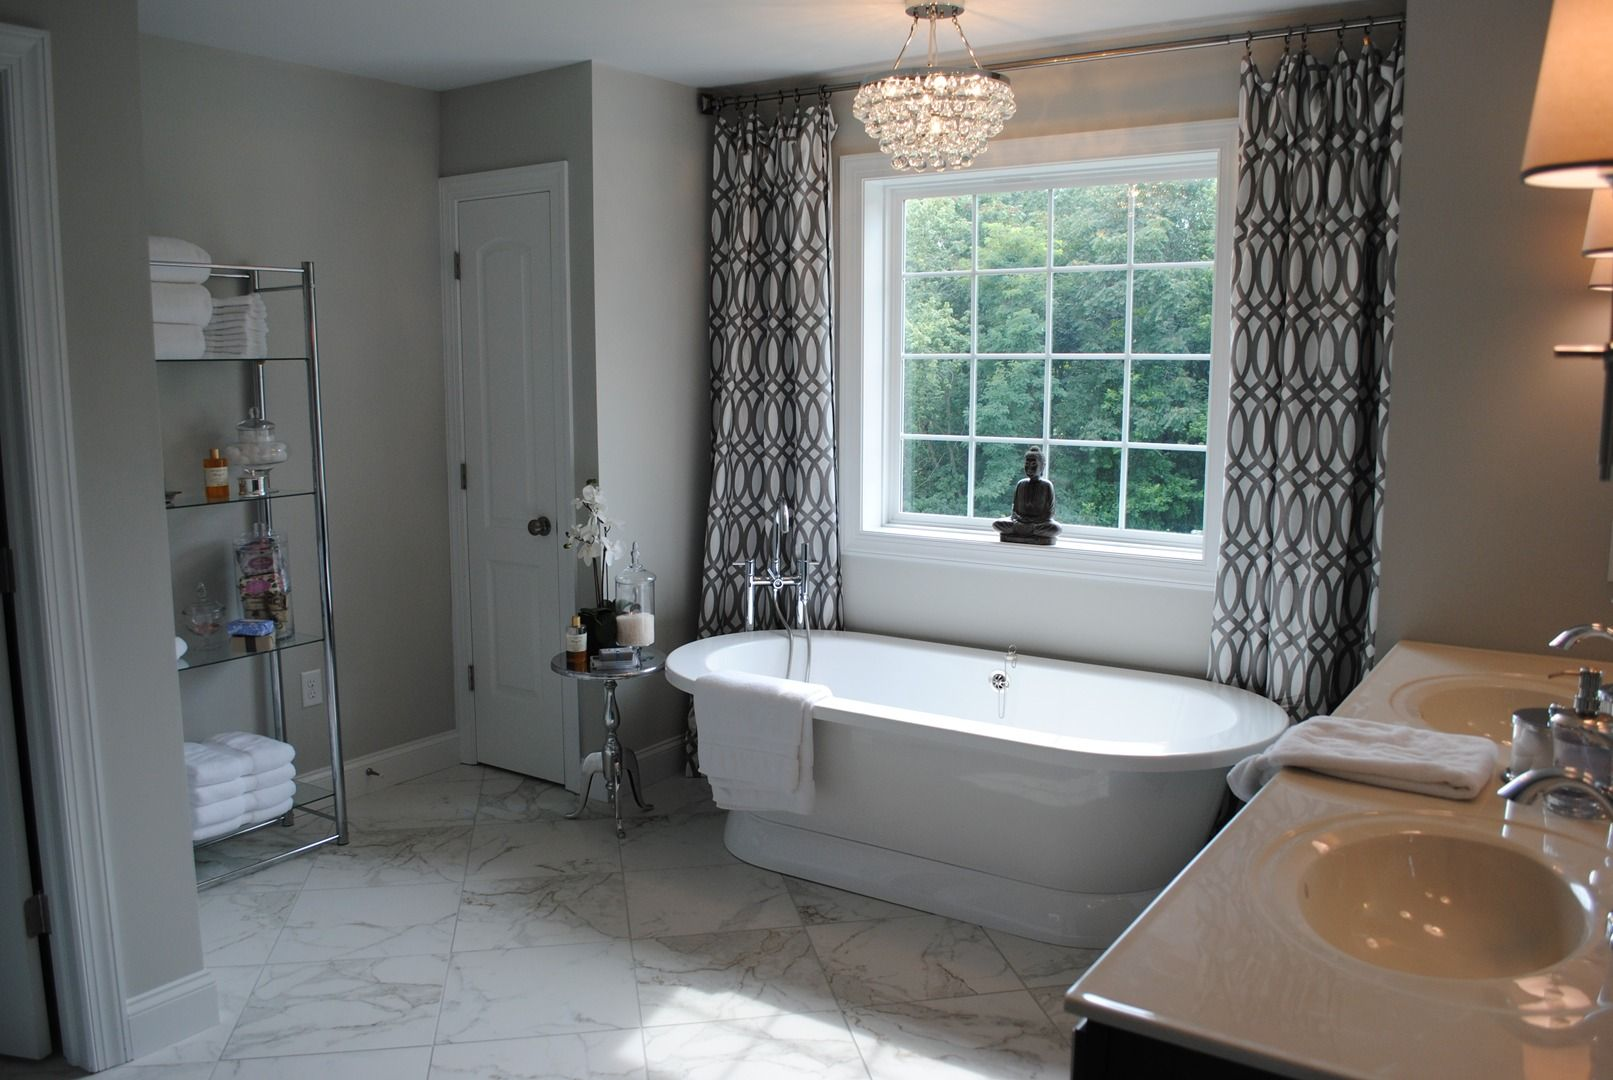 Http Stlkitchenbathrenovations Com Stl Kitchen Bath Renovations Is An Award Winning Indus Kitchen Bathroom Remodel Bath Remodel Kitchen And Bath Remodeling